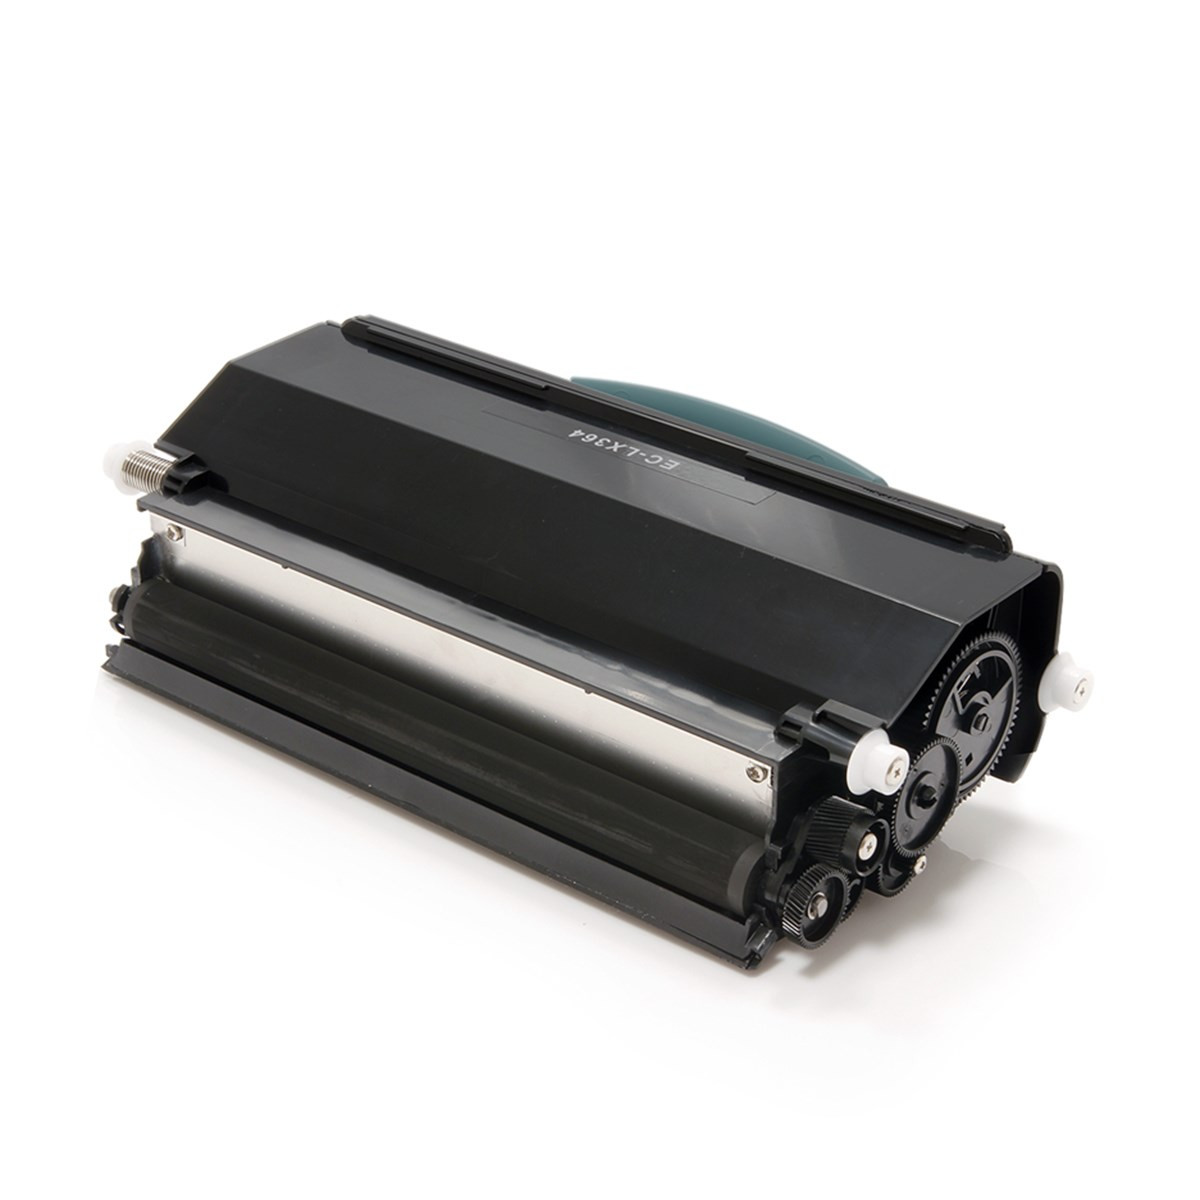 Toner Compatível com Lexmark X264 X363 X364 X364DN X264DN X264A11G | Premium 3.5k